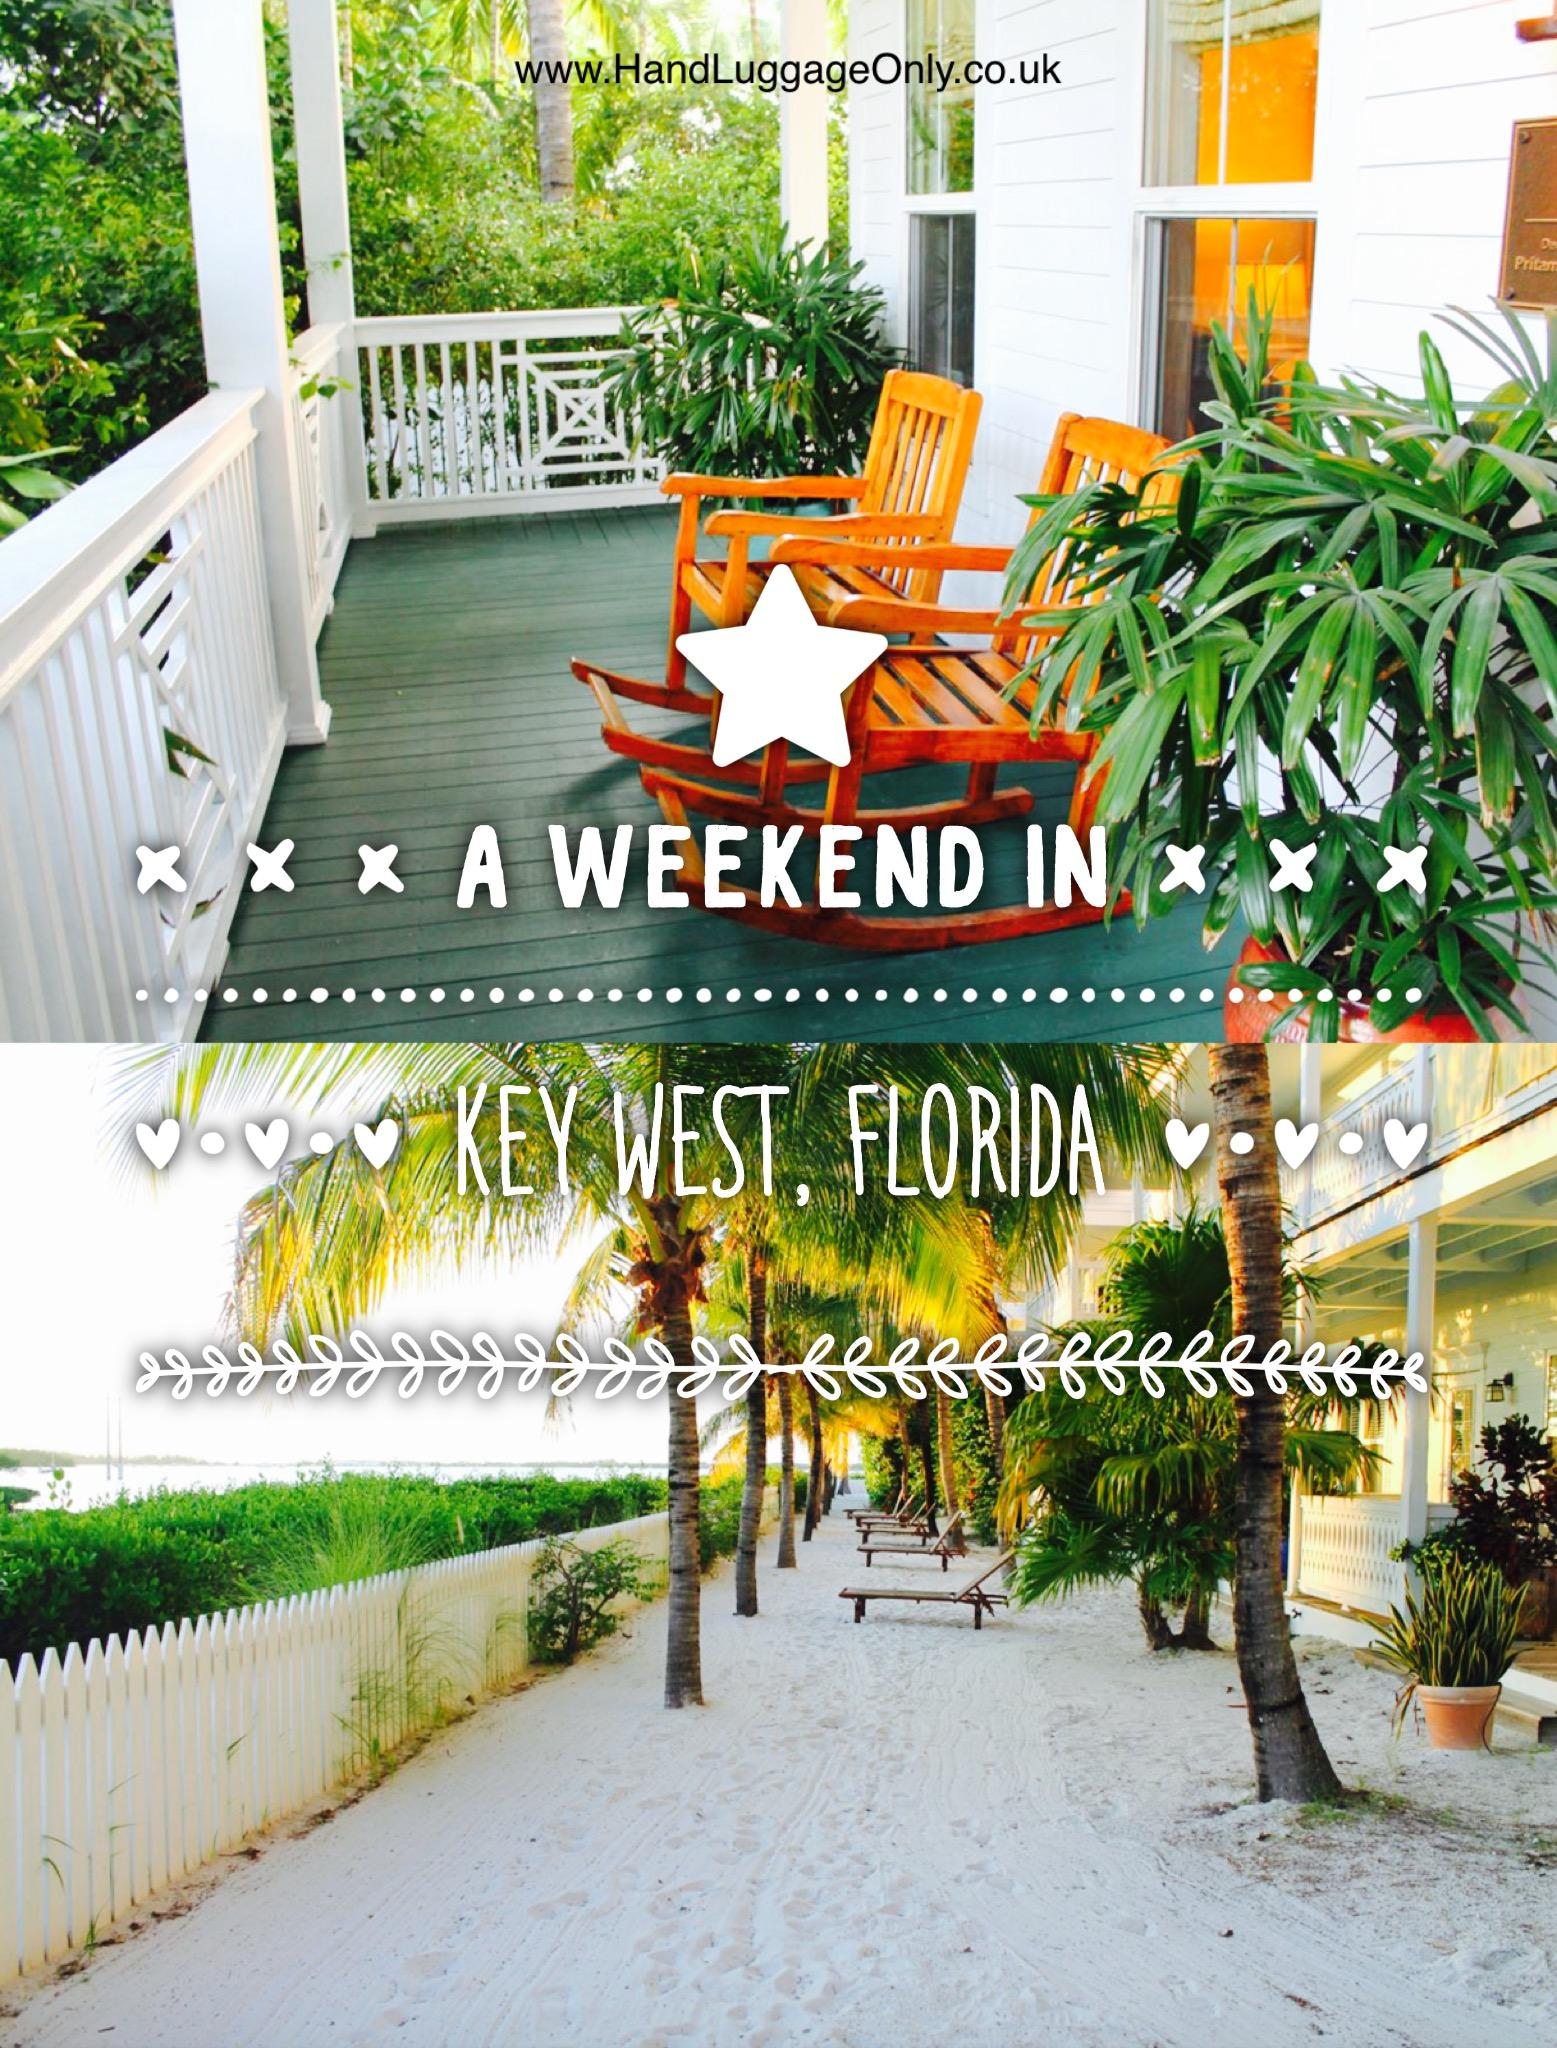 Arrival in Key West!